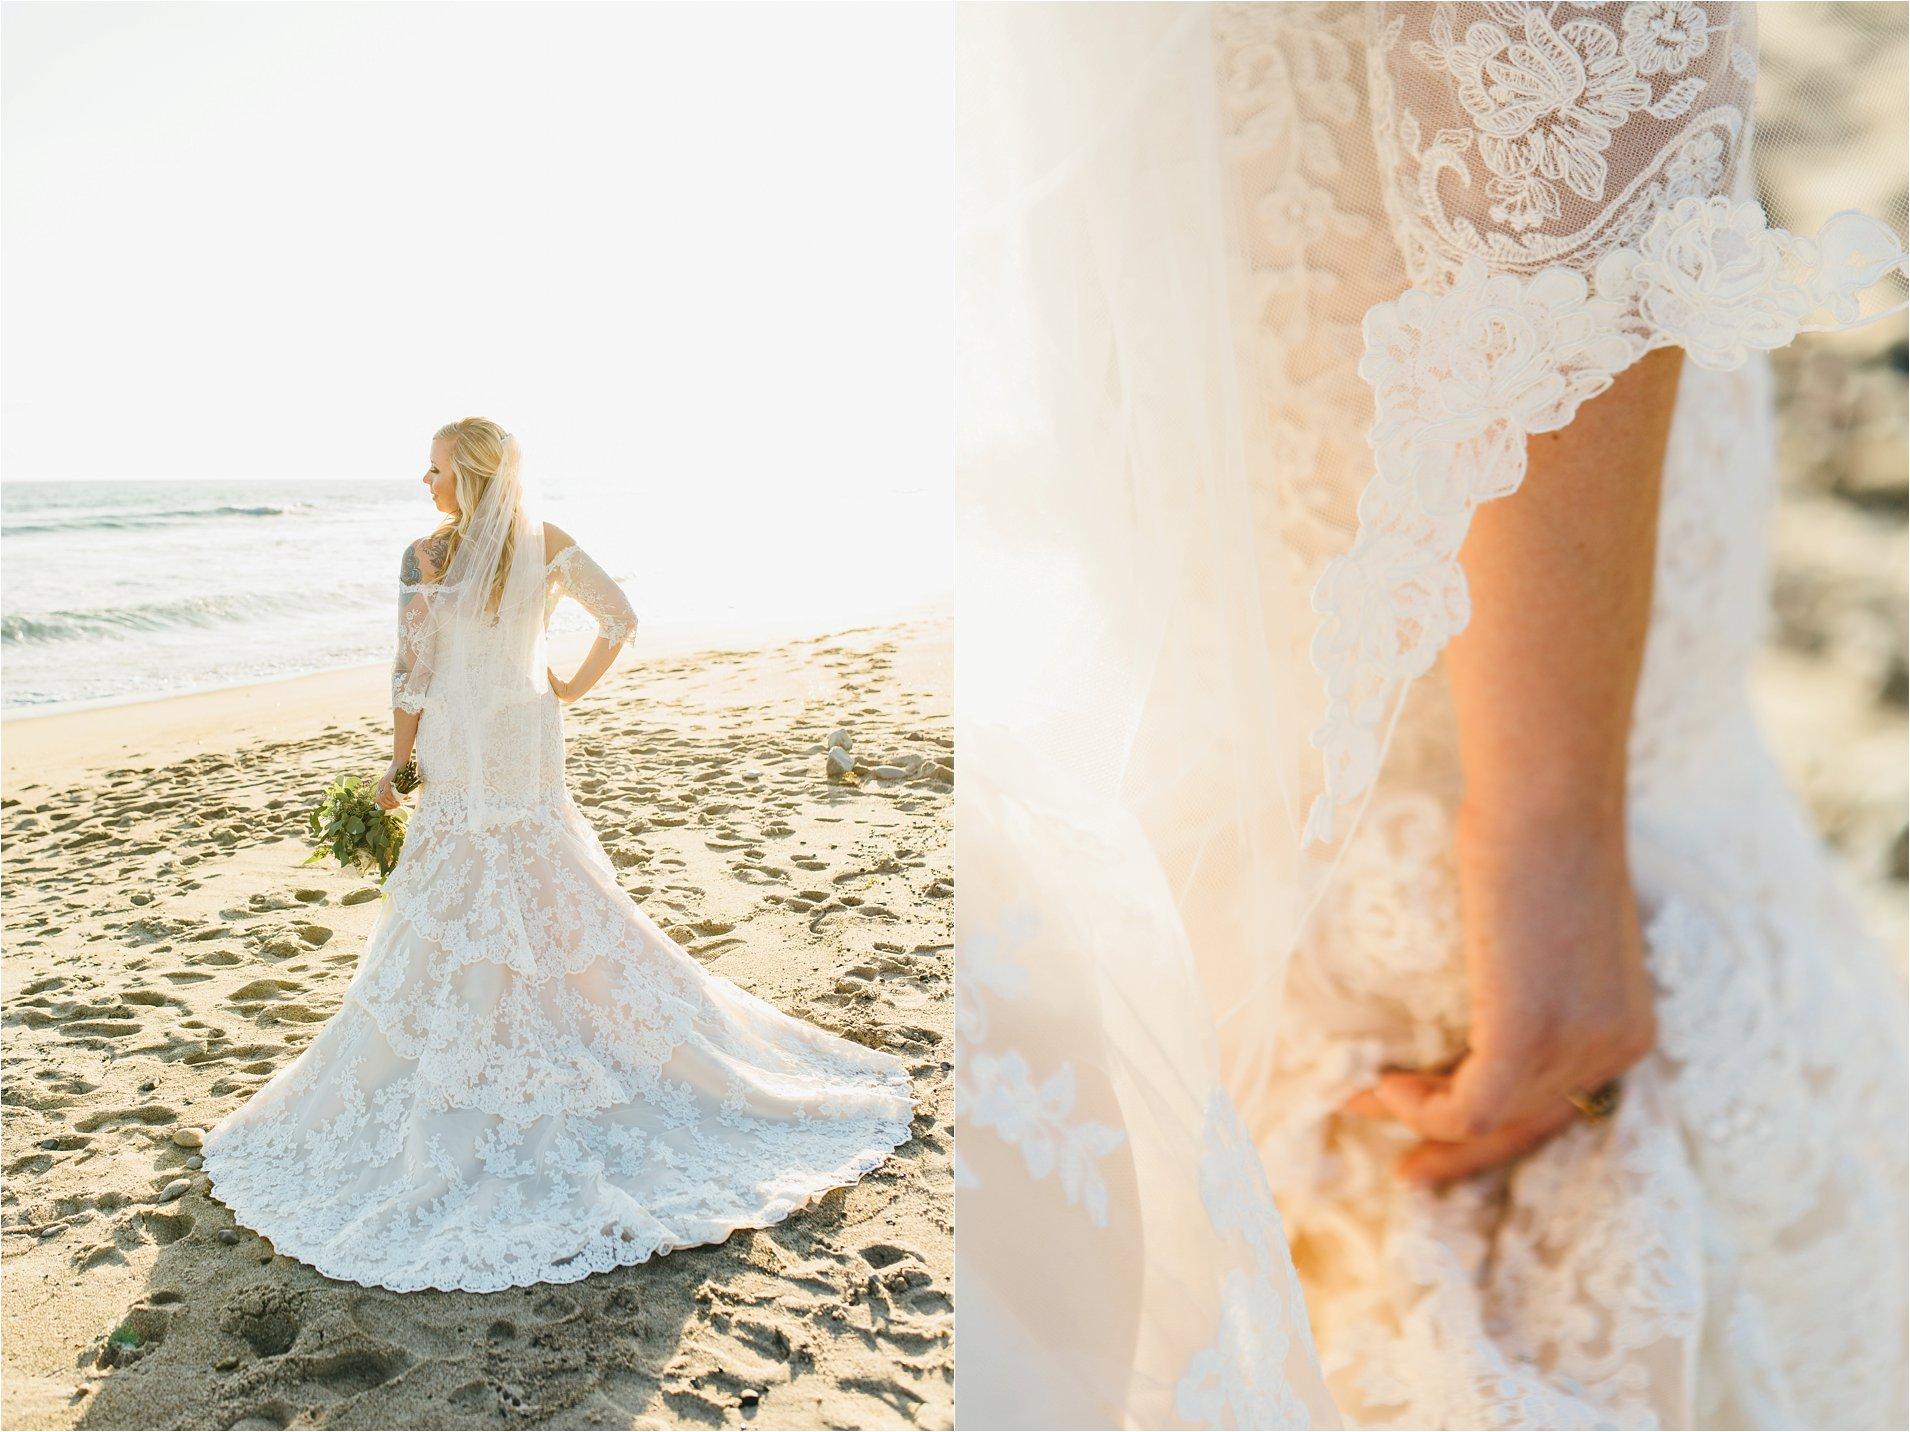 Lace Wedding Dress in Orange County